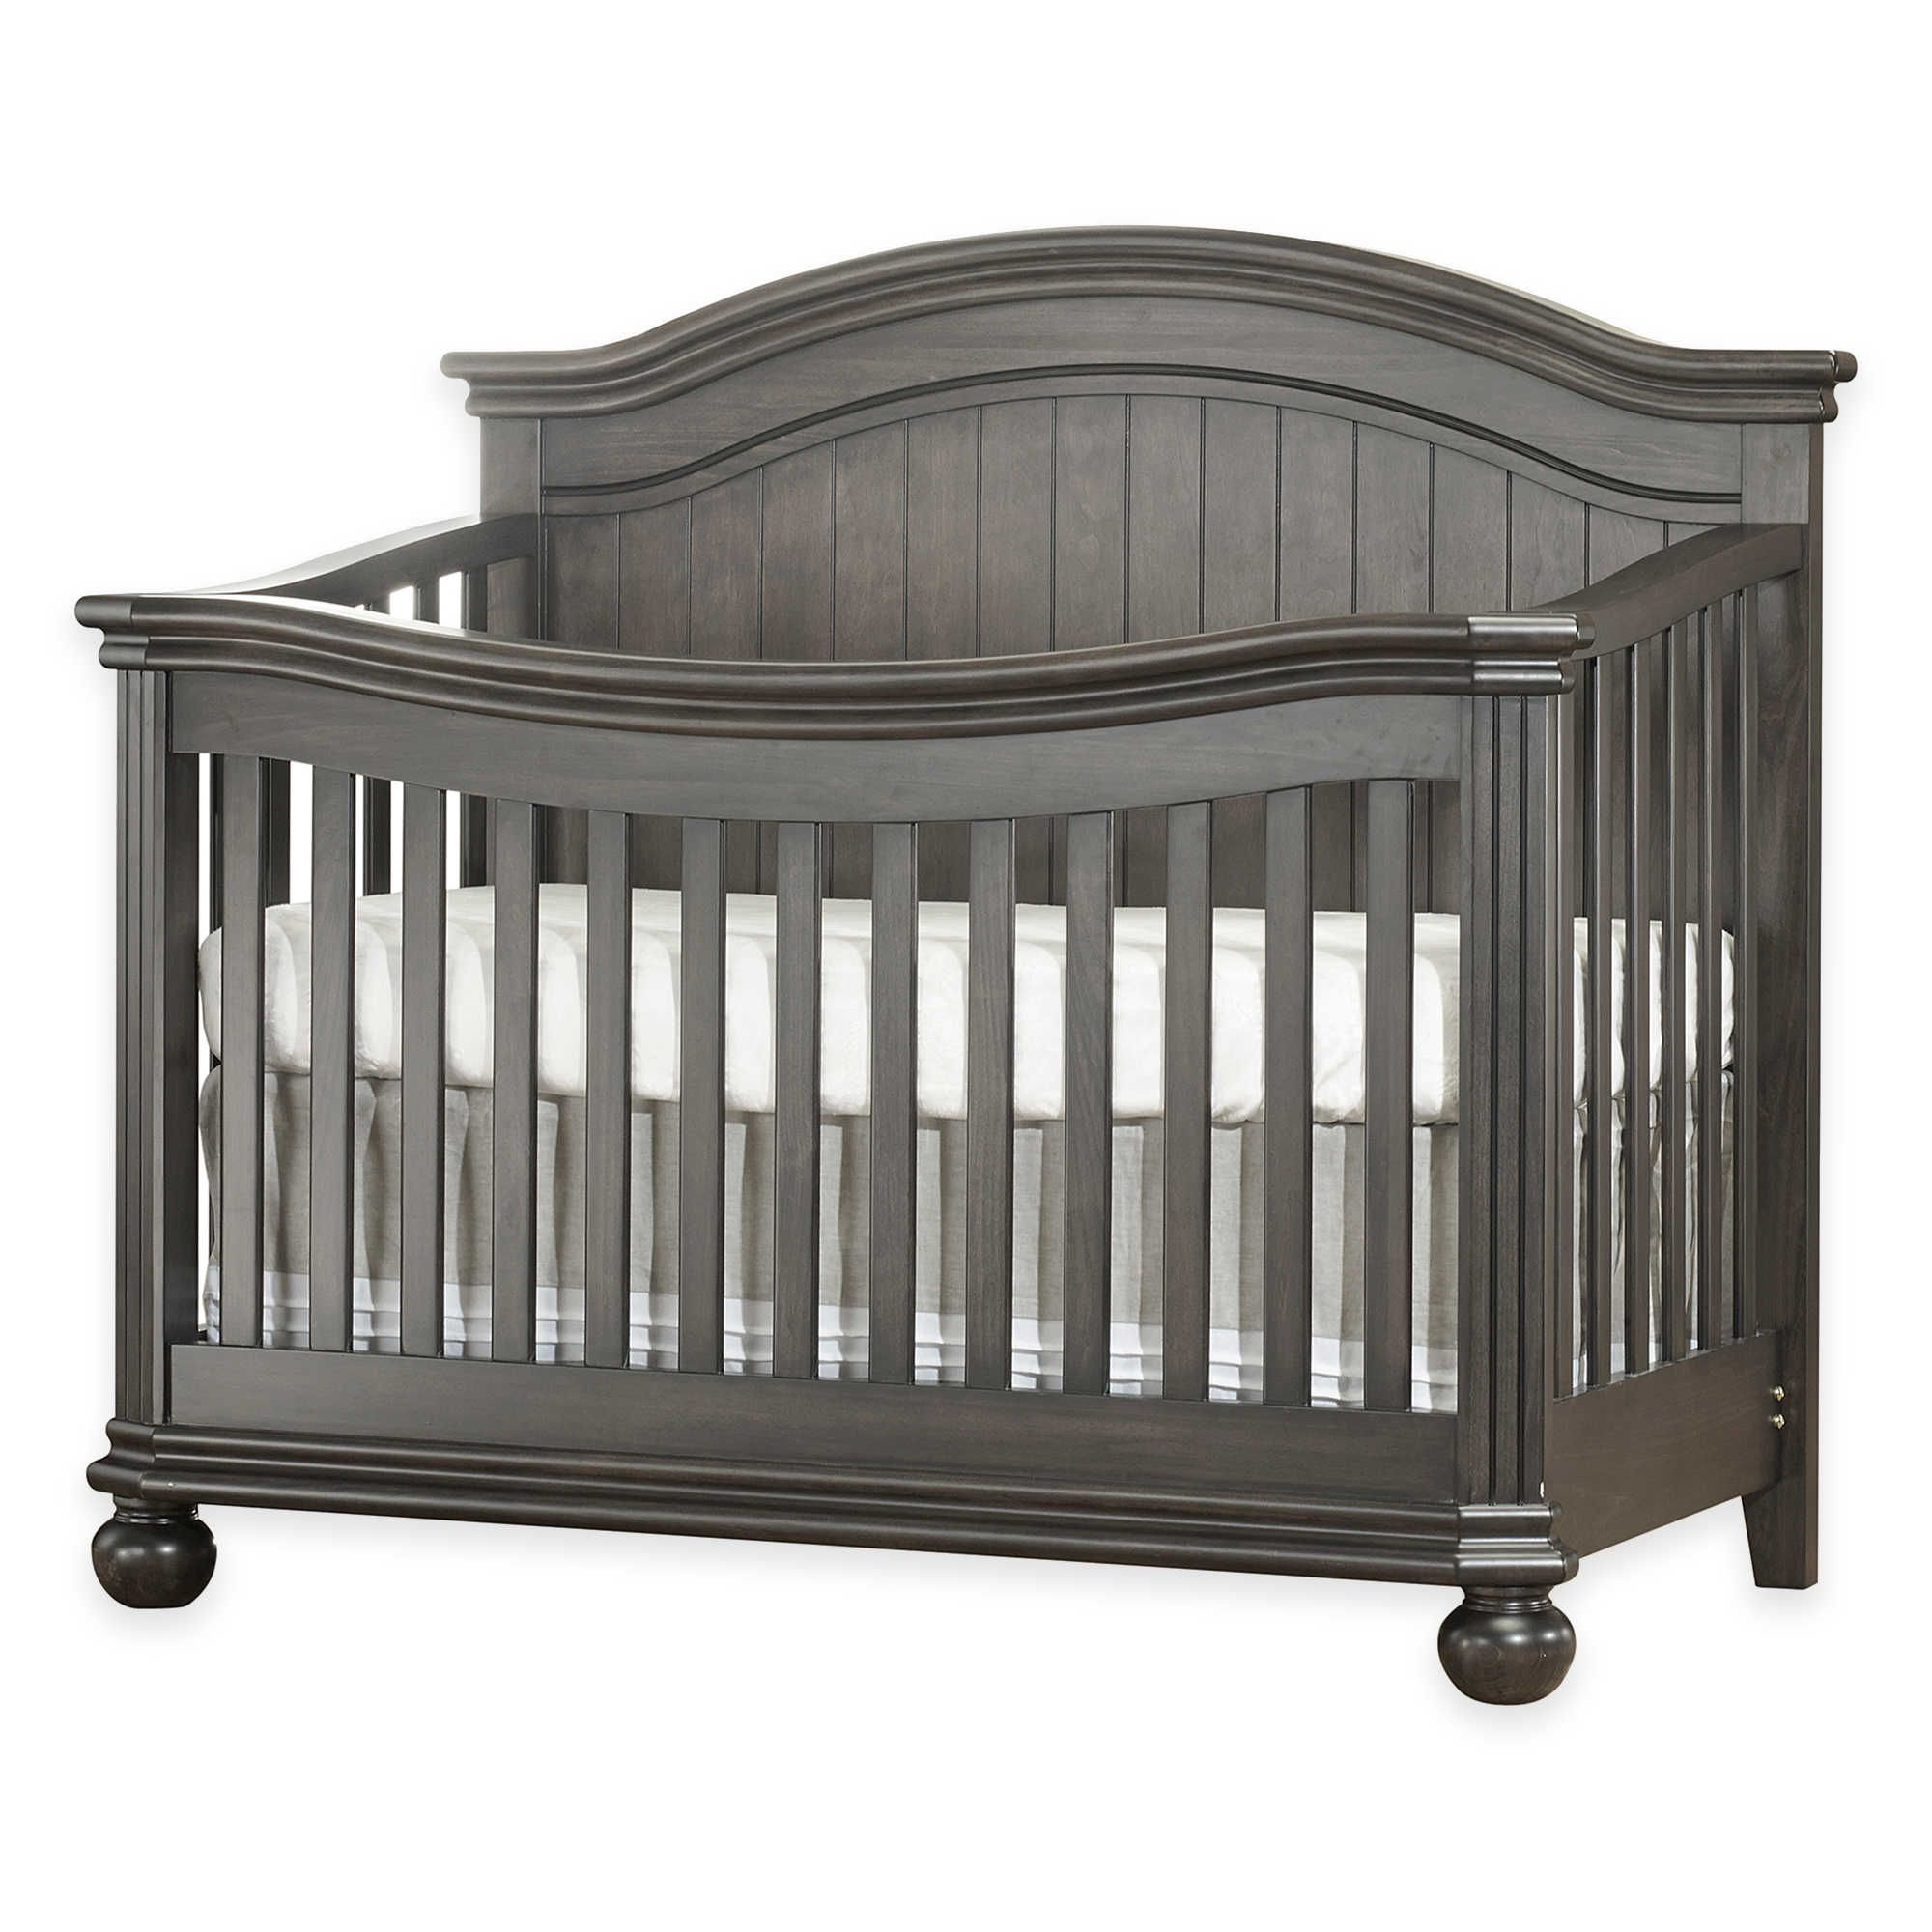 Sorelle Finley 4 In 1 Convertible Crib In Vintage Grey